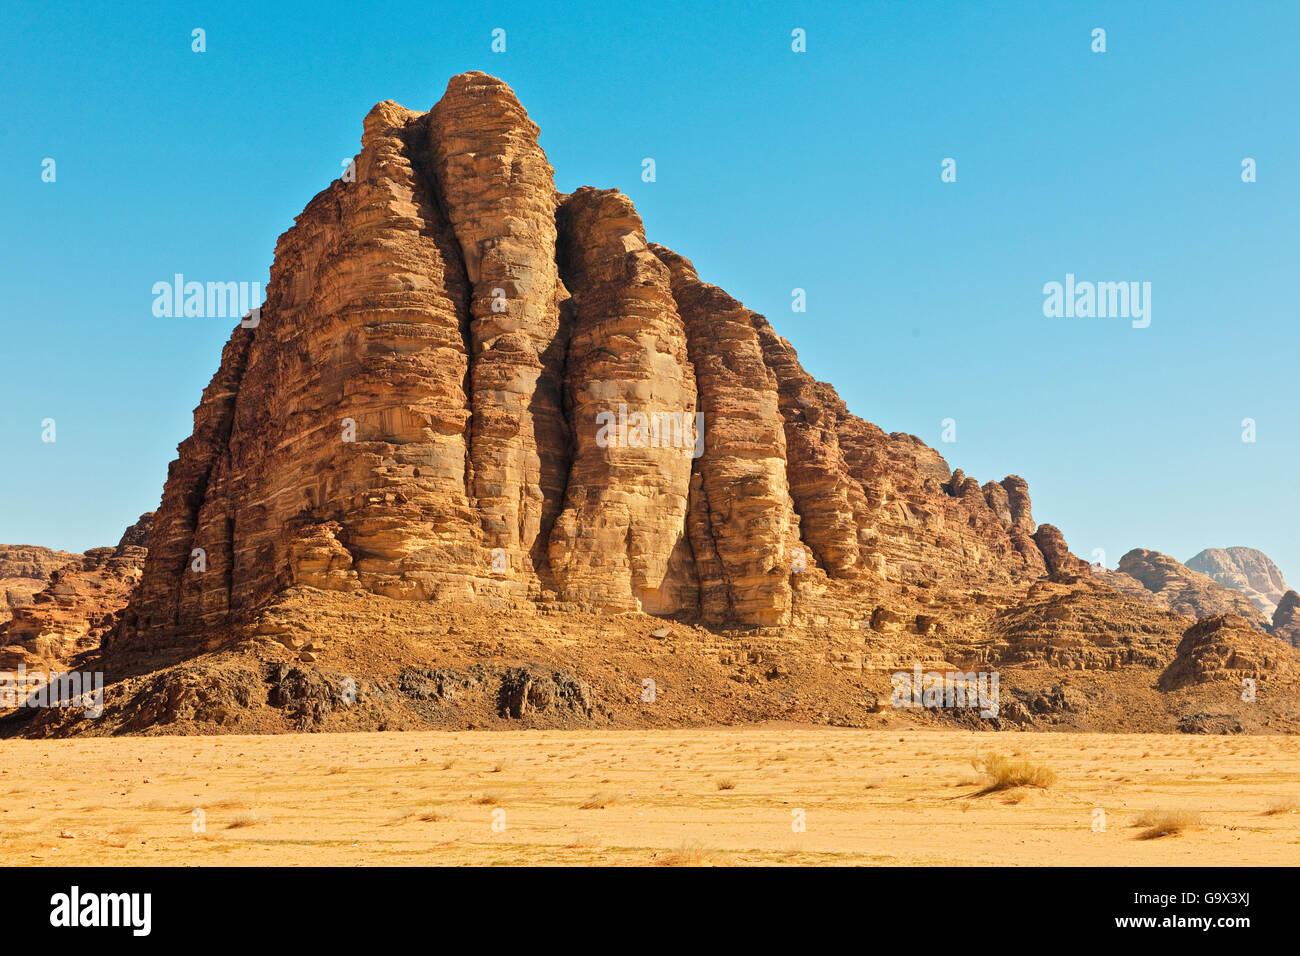 Seven Pillars of Wisdom, Wadi Rum, Jordan, Asia minor Stock Photo